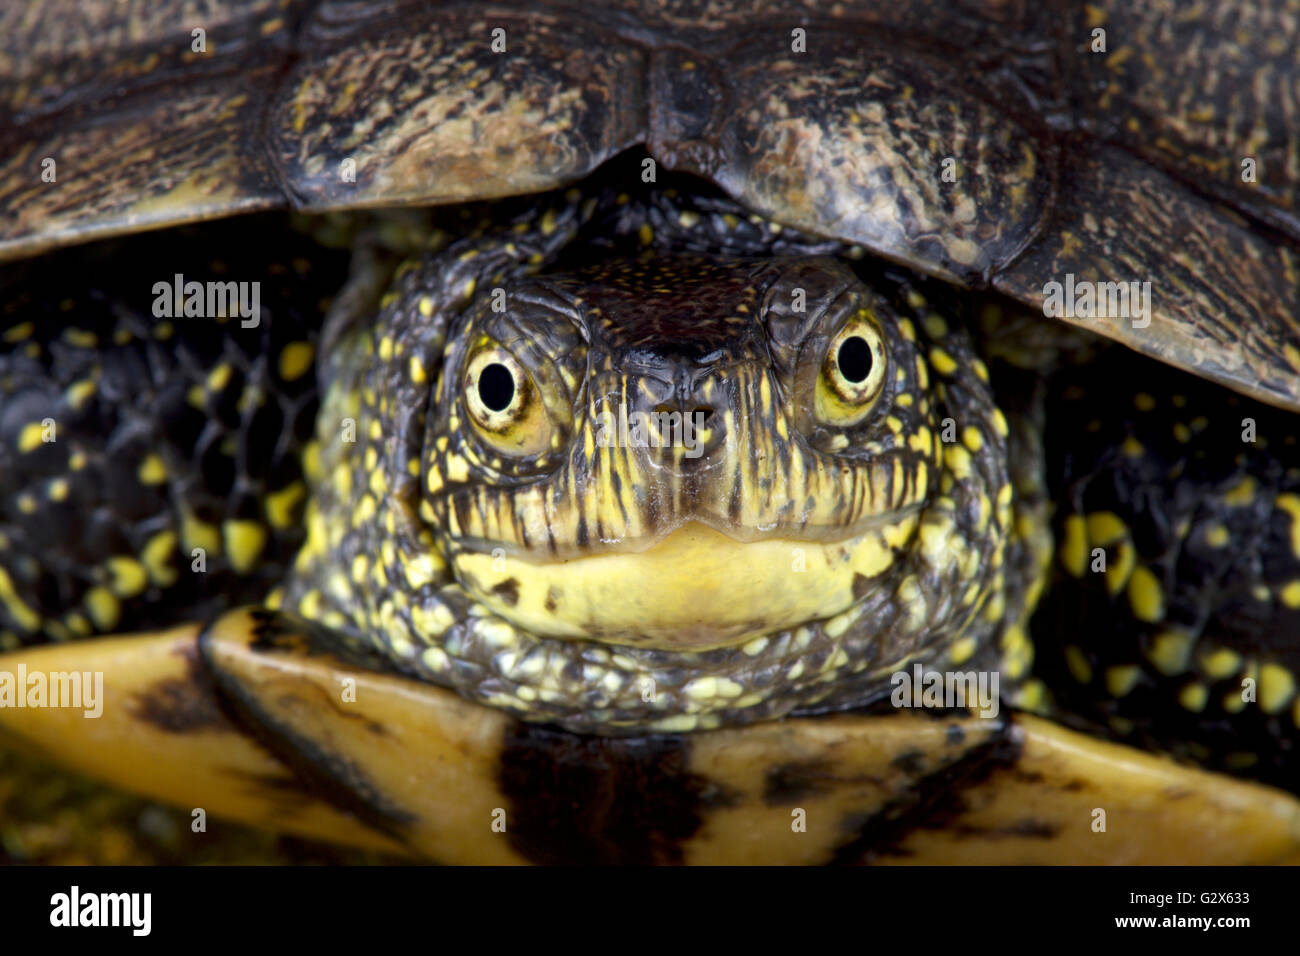 European pond turtle (Emys orbicularis) - Stock Image